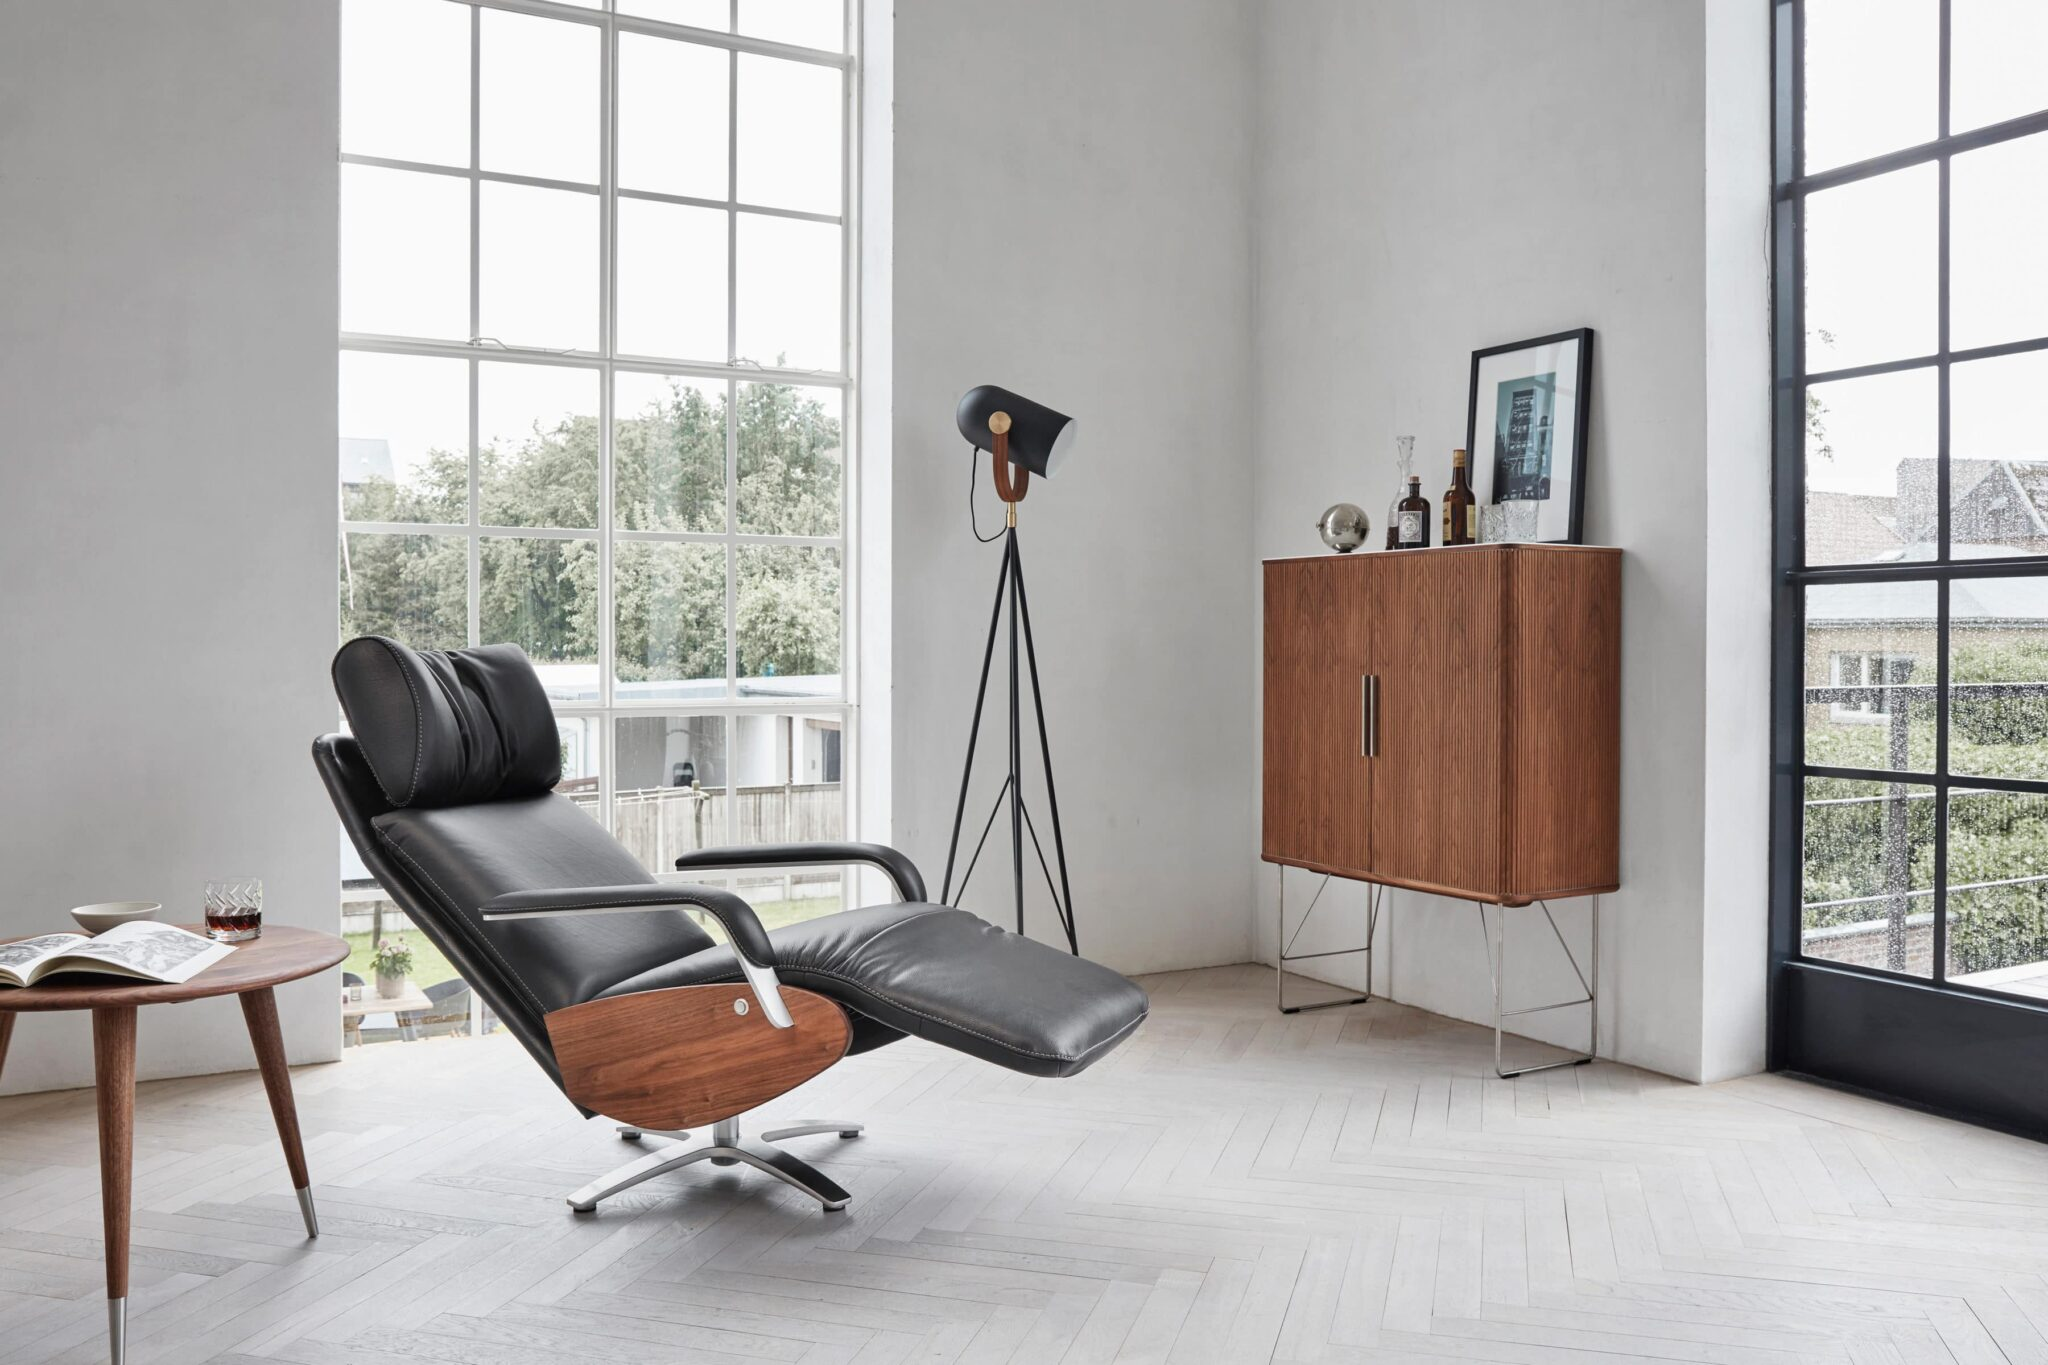 Hemelaer-Interior-Berg-Furniture-Berg Coda Relax 3-3600x2400-1